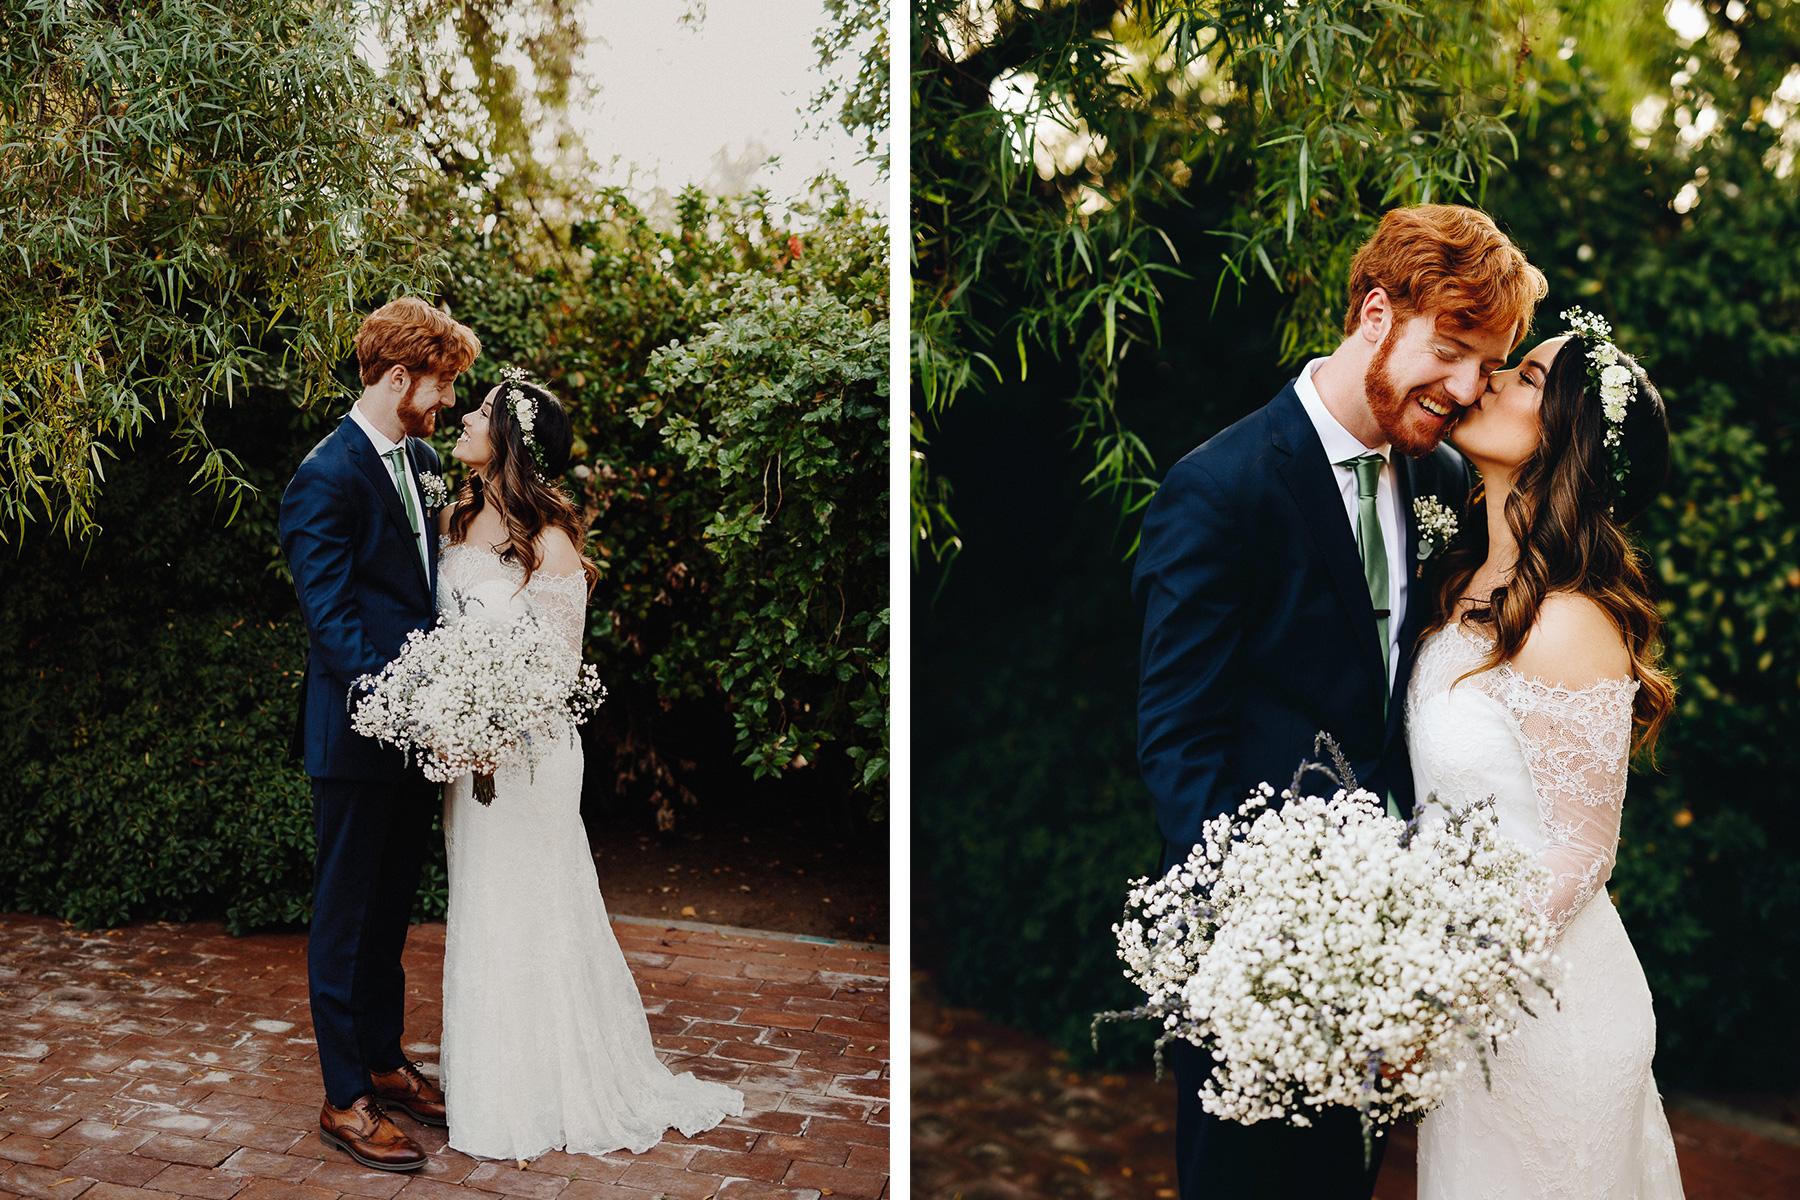 181104-Luxium-Weddings-Arizona-@matt__Le-Brandon-Kariana-Phoenix-Valley-Garden-Center-1078a.jpg